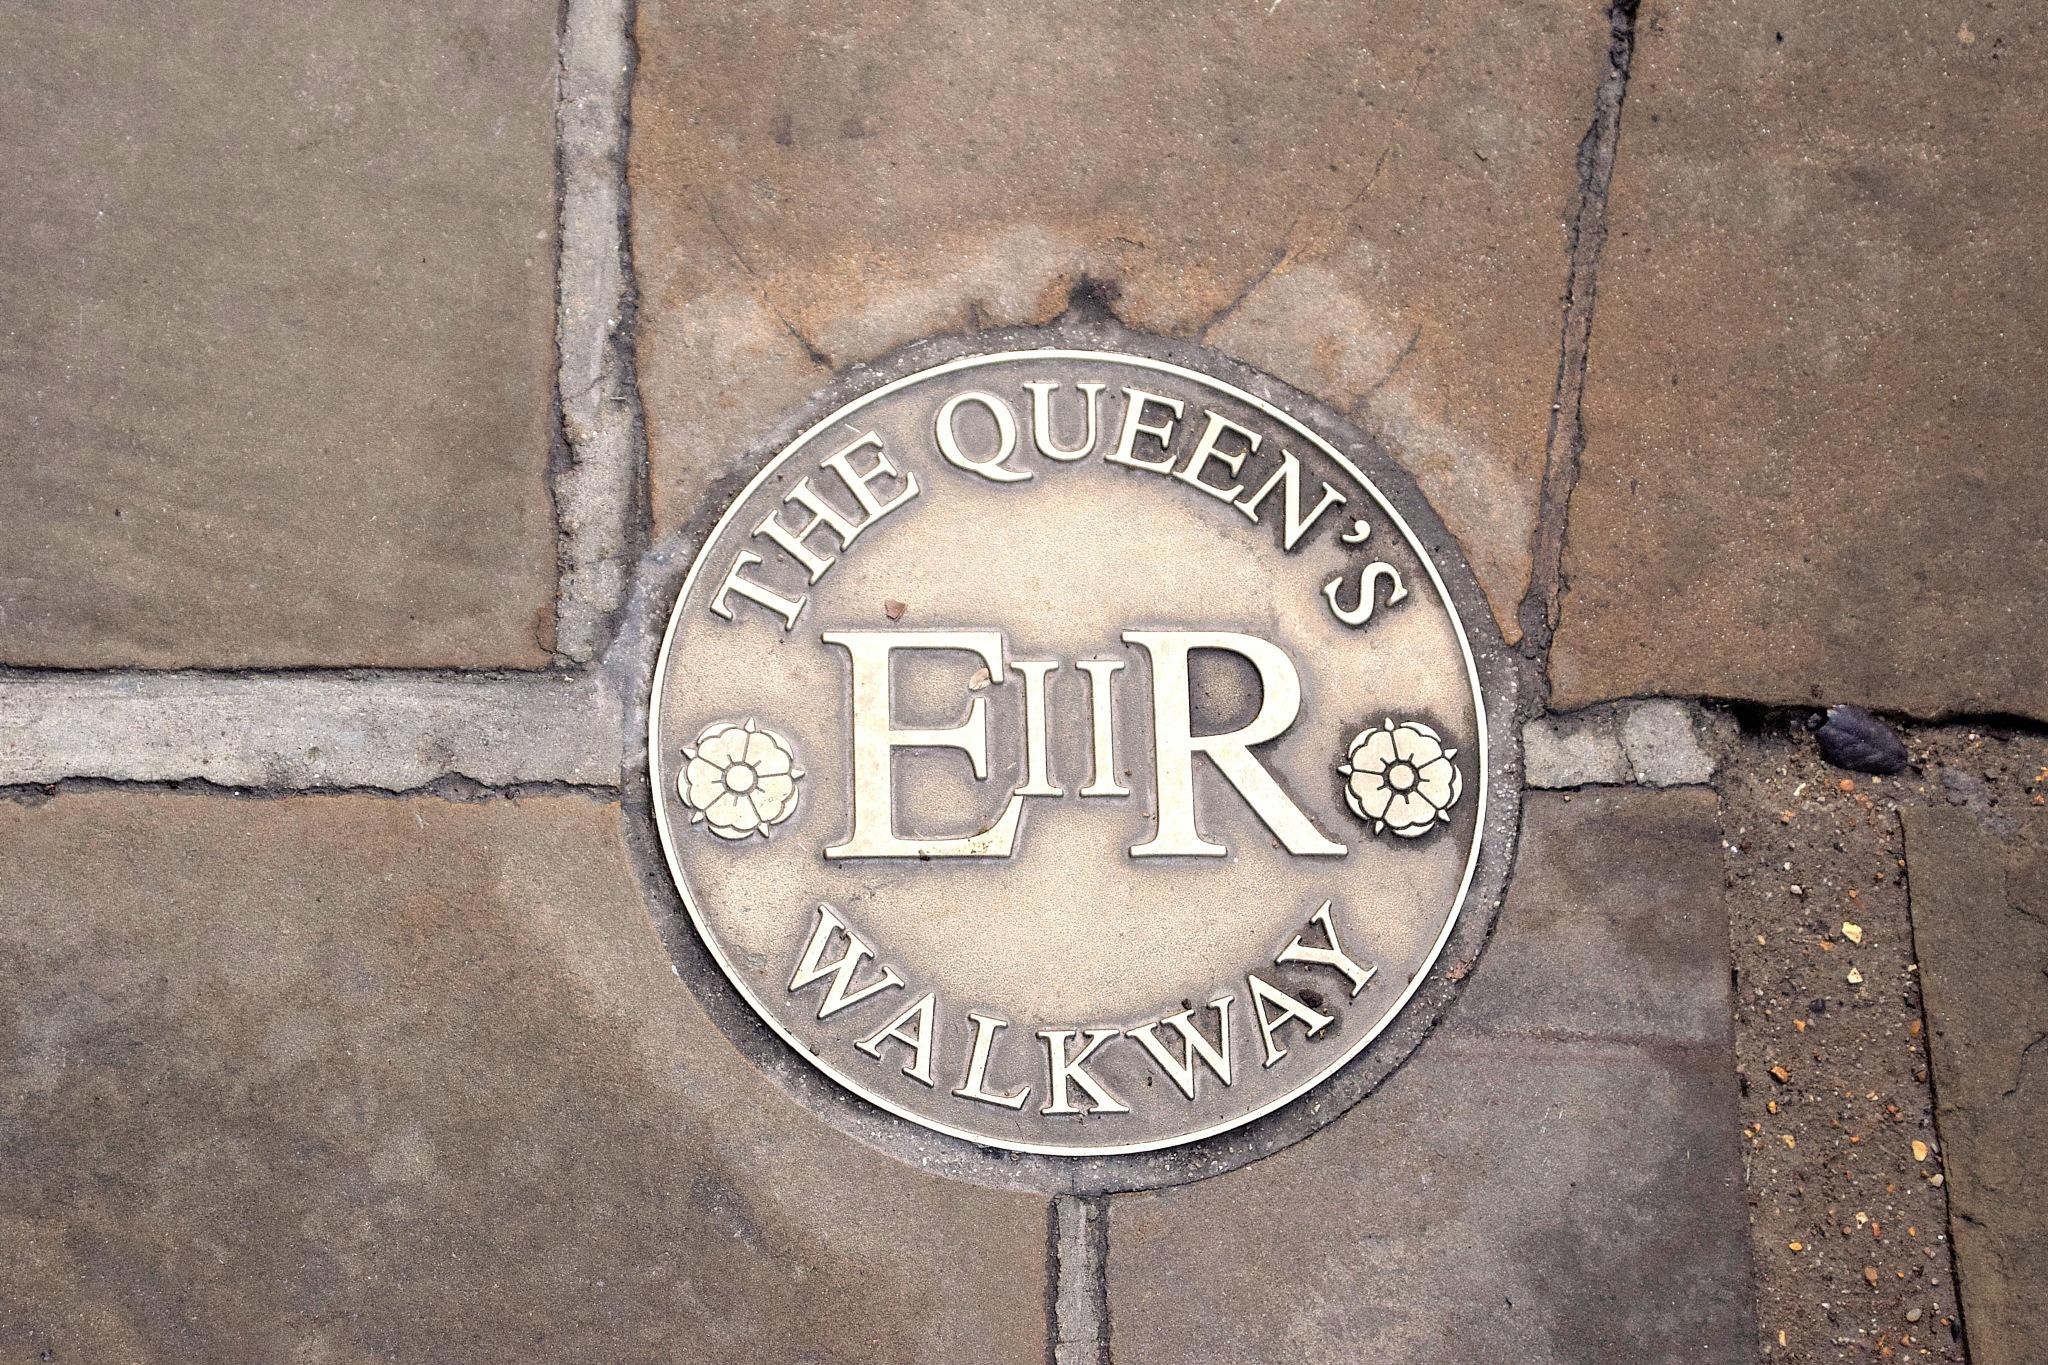 Queen's walkway  by cliff.edmundson.3